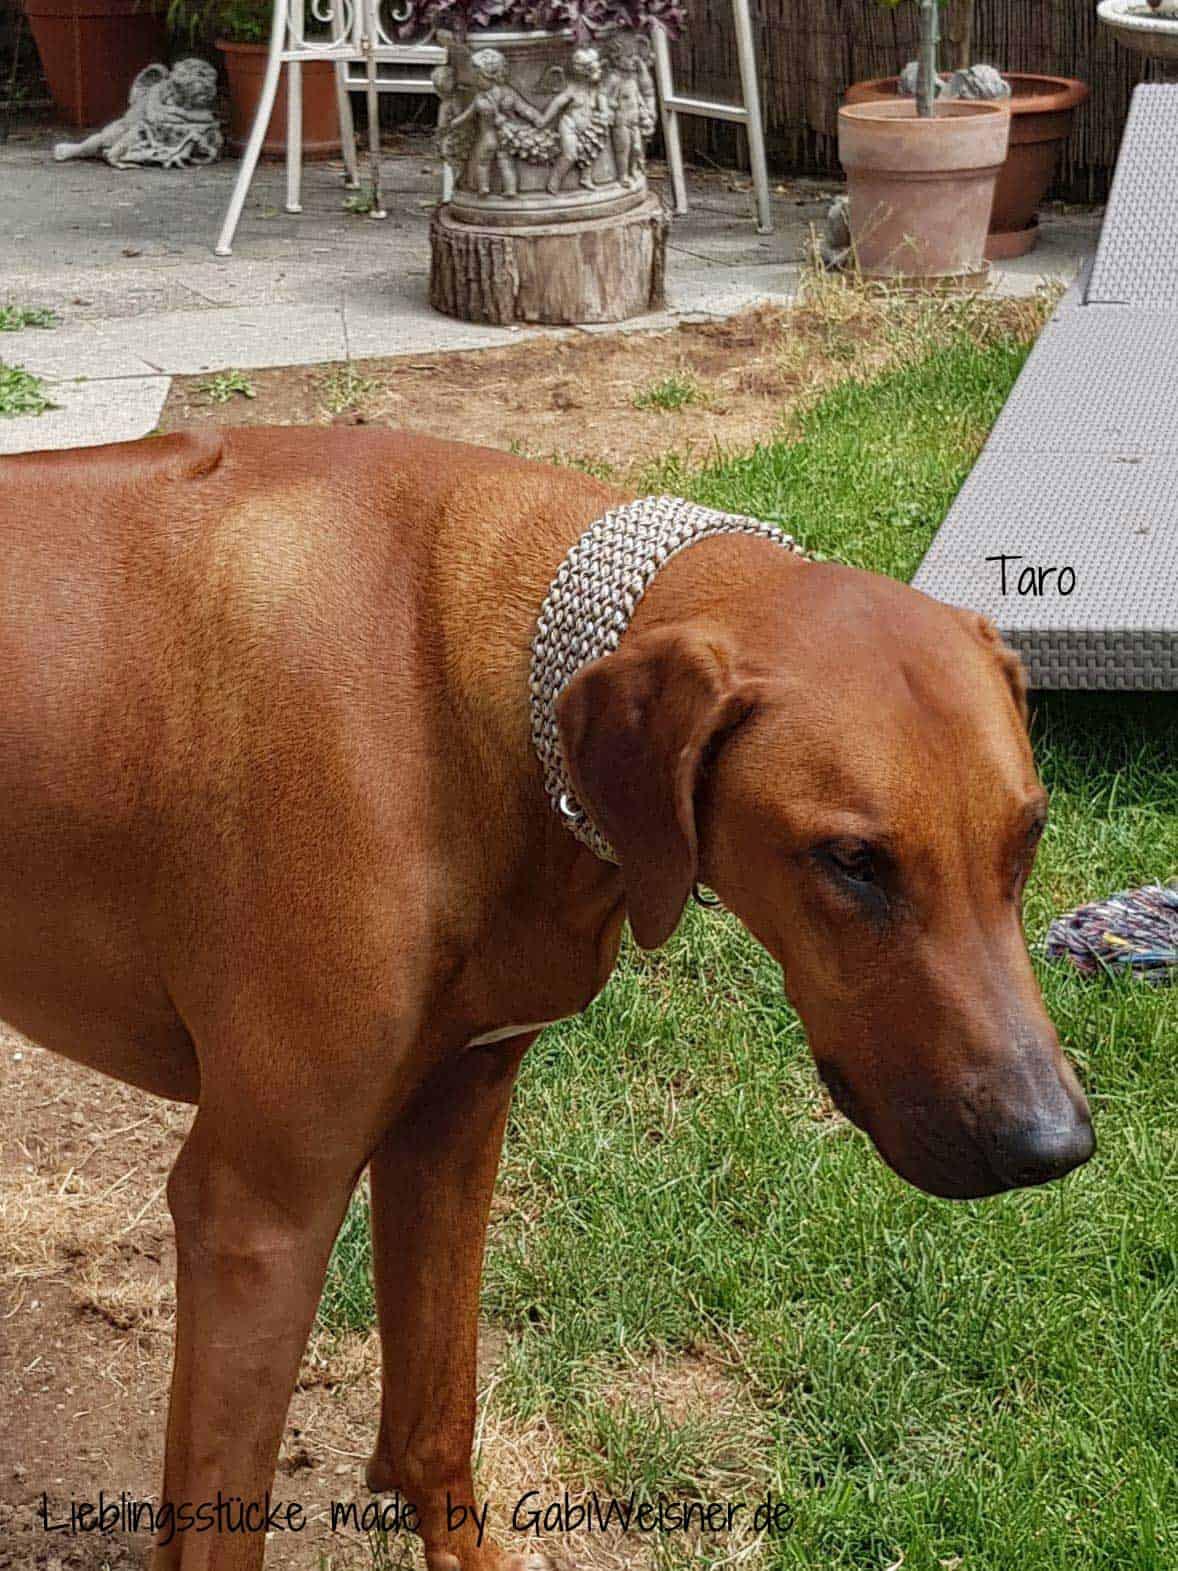 Hundehalsband Paracord 5 cm breit großer Alu-Max® Klickverschluss